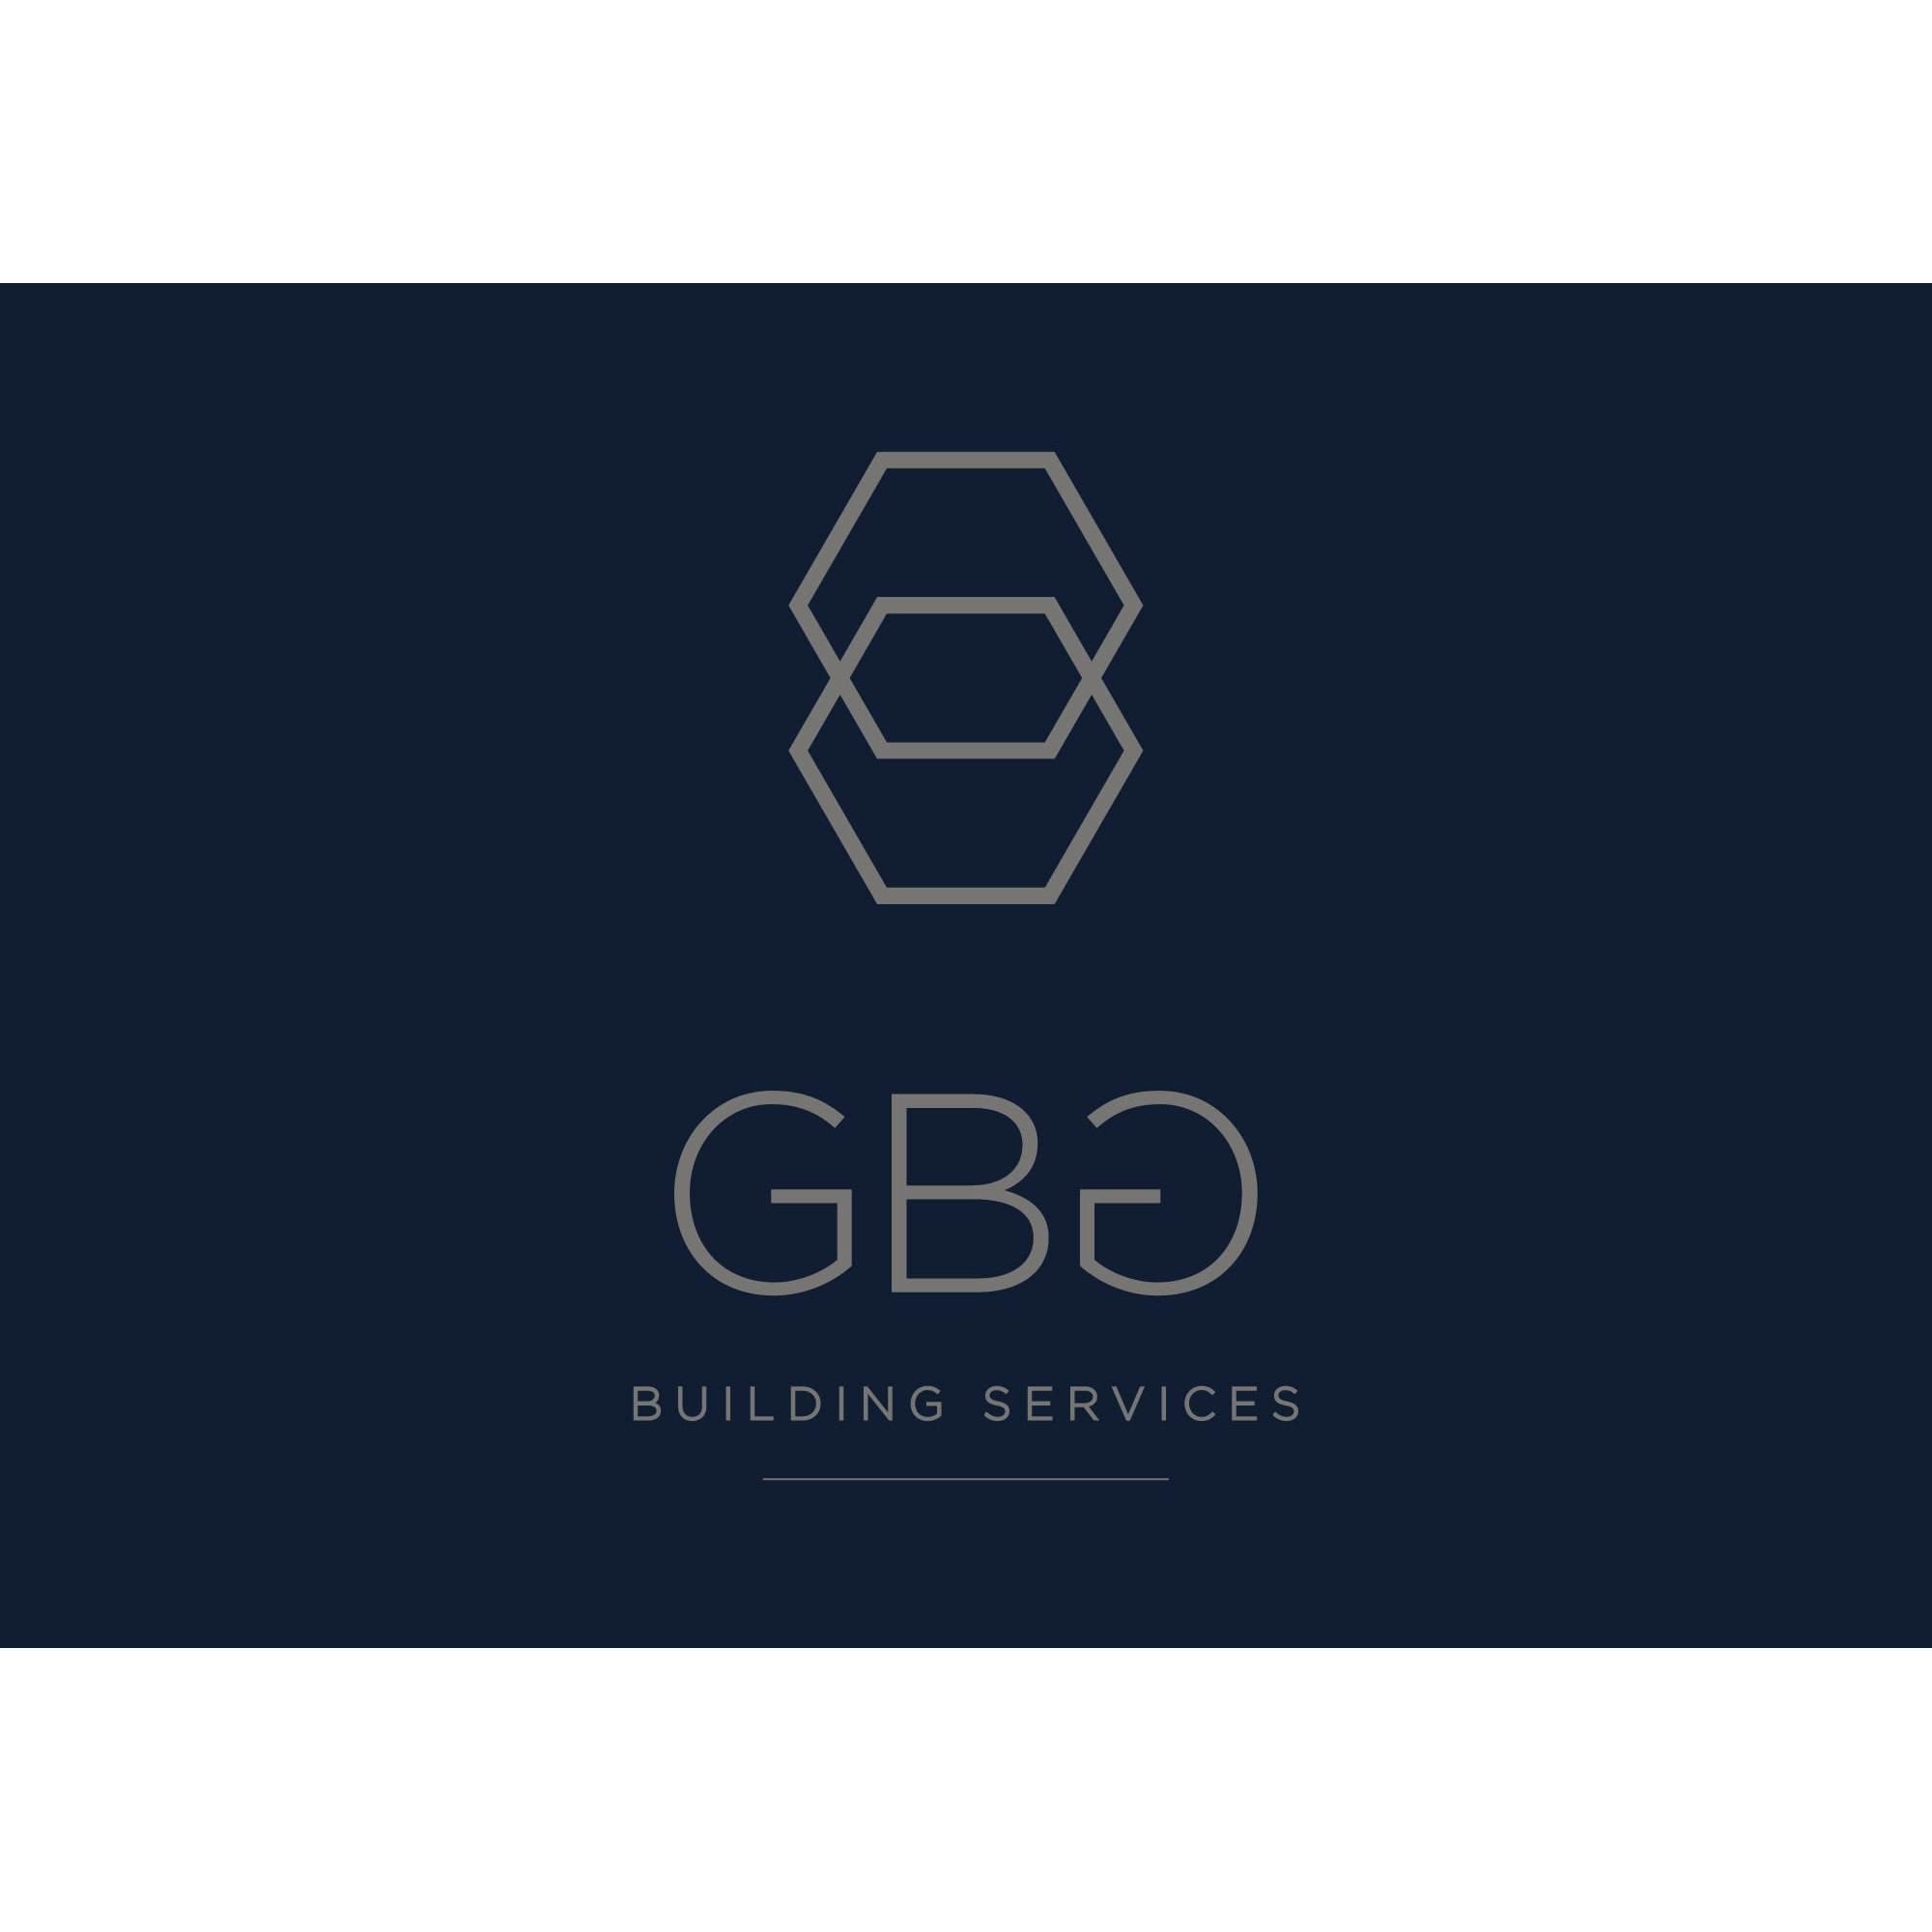 GBG Building Services Ltd - Greenford, London UB6 8LL - 07917 876080 | ShowMeLocal.com